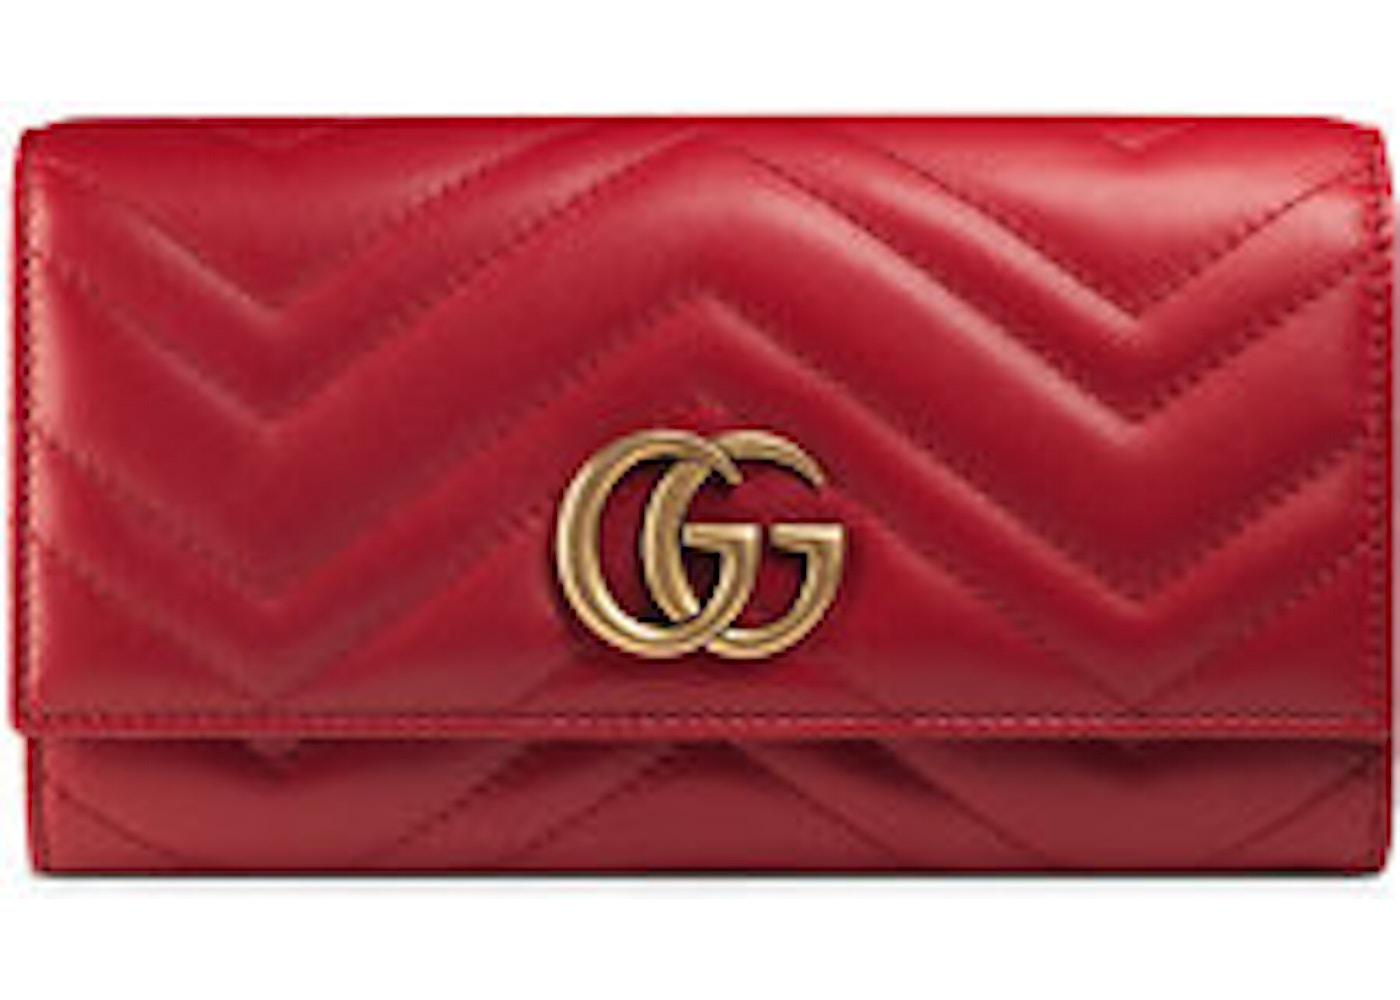 d471933f0df7 Gucci Continental Wallet Marmont Matelasse GG Hibiscus Red. Matelasse GG  Hibiscus Red